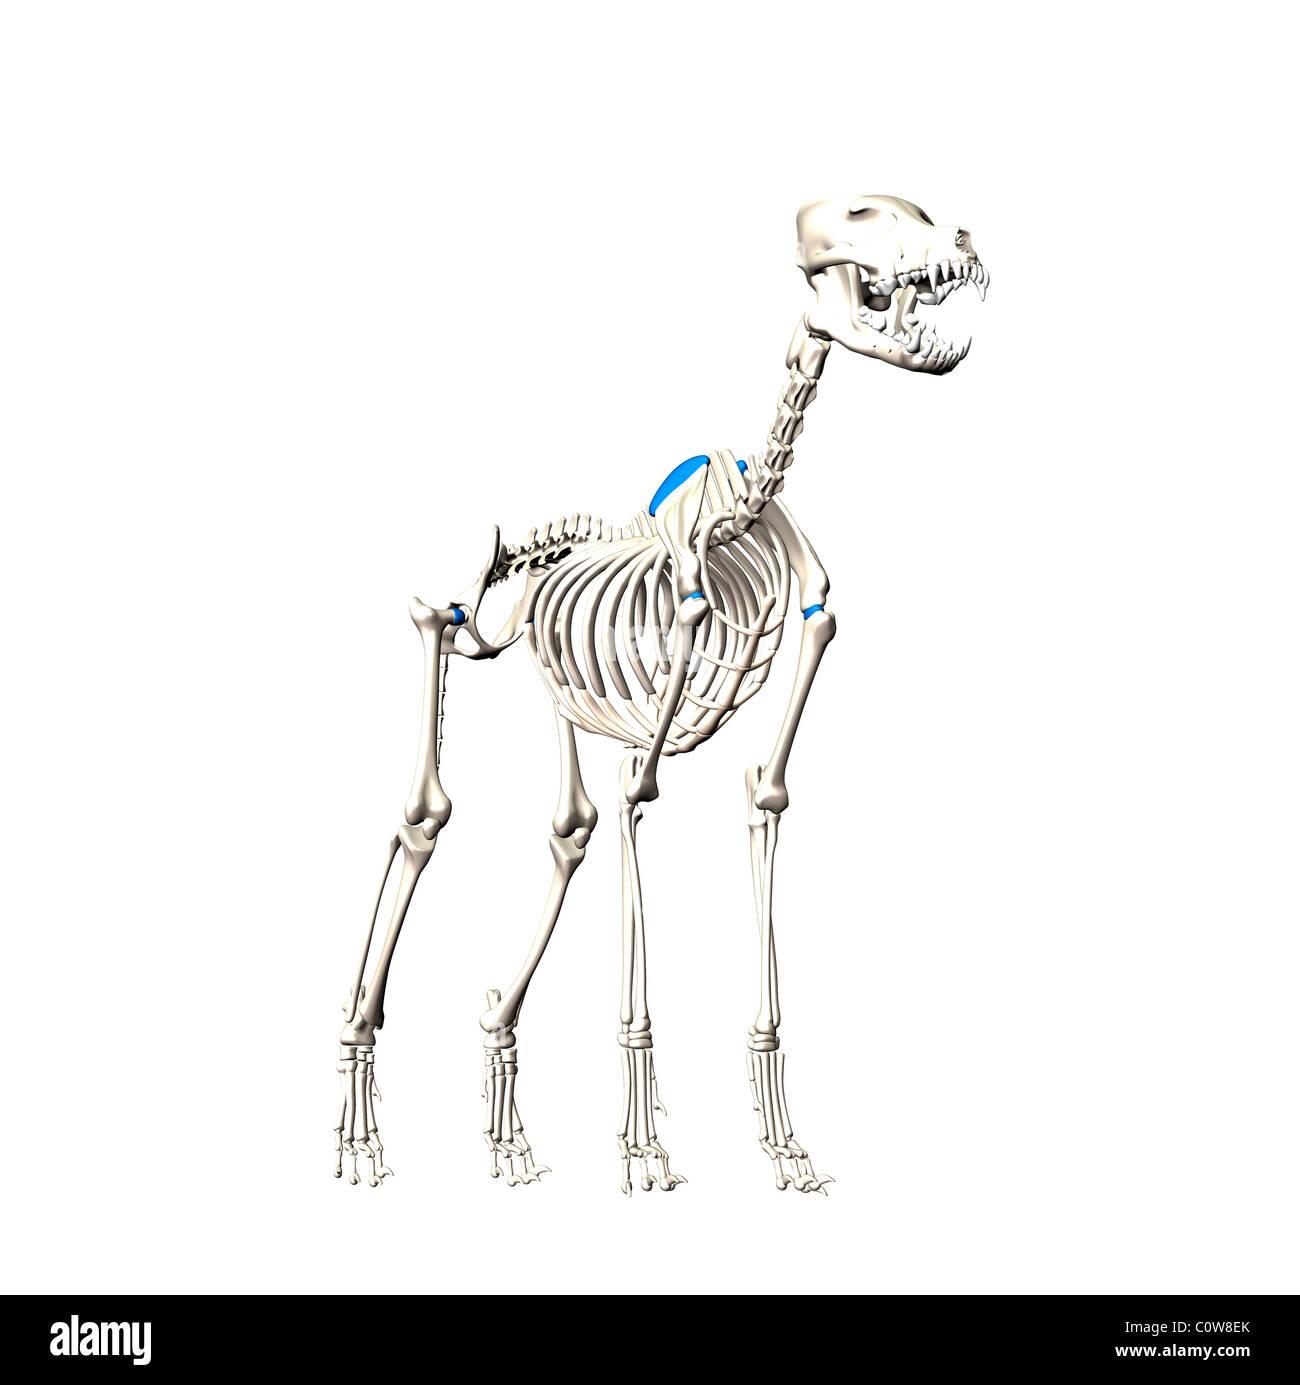 Hund Anatomie Skelett Stockfoto, Bild: 34976219 - Alamy